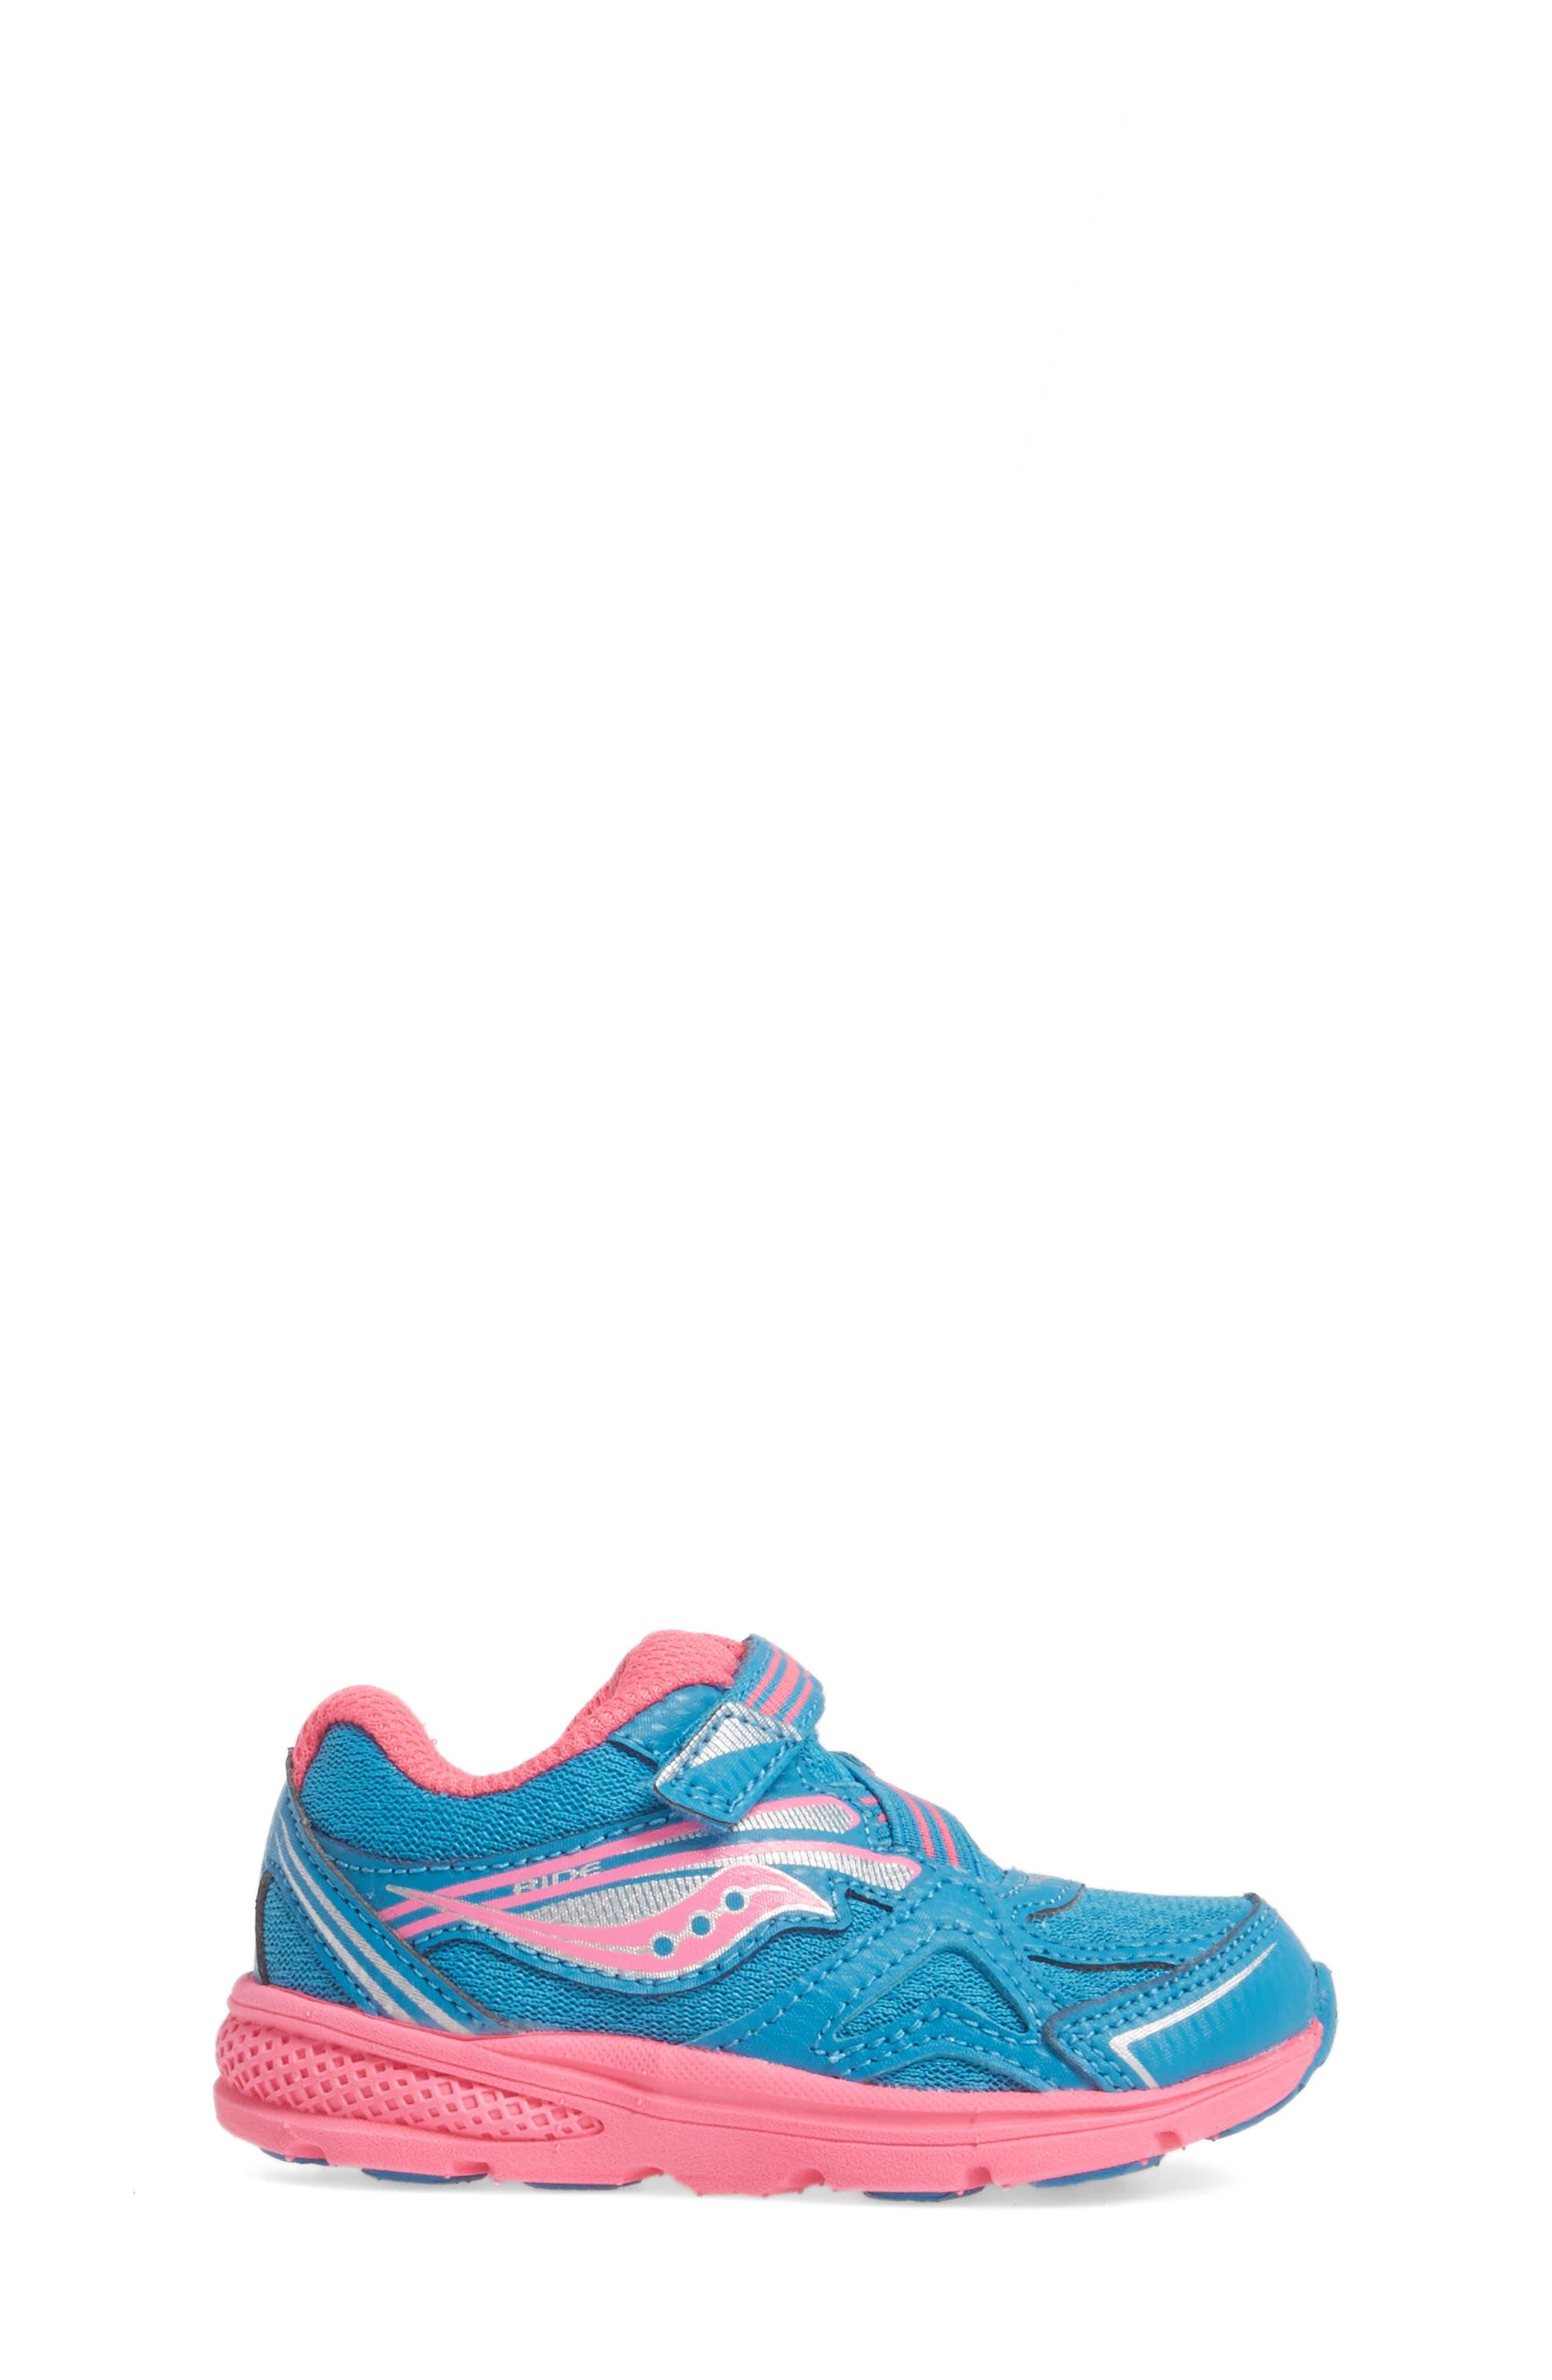 'Baby Ride' Sneaker,                             Alternate thumbnail 3, color,                             401